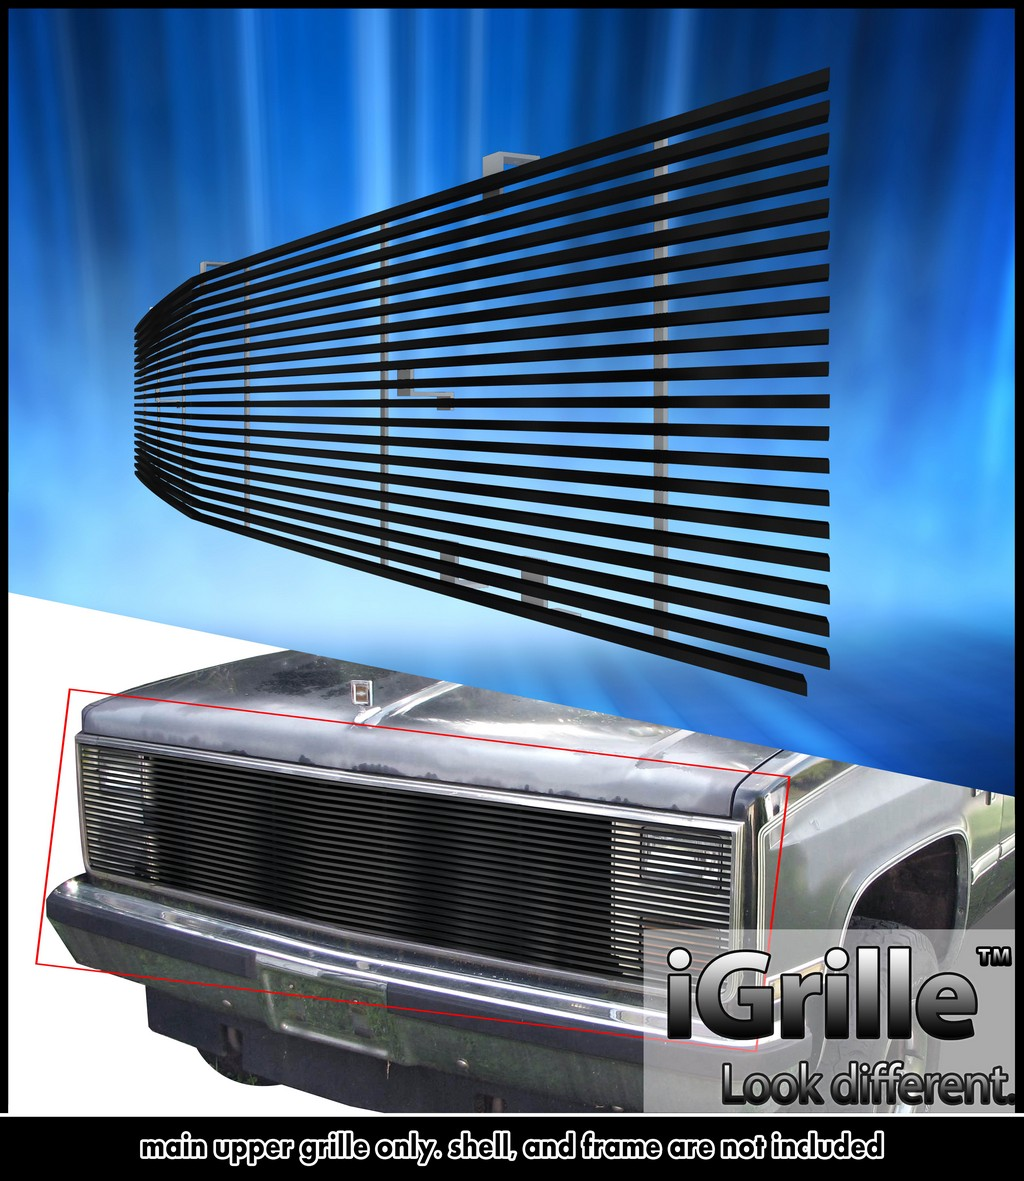 hight resolution of 81 87 chevy gmc pickup suburban blazer jimmy black stainless billet grille walmart com